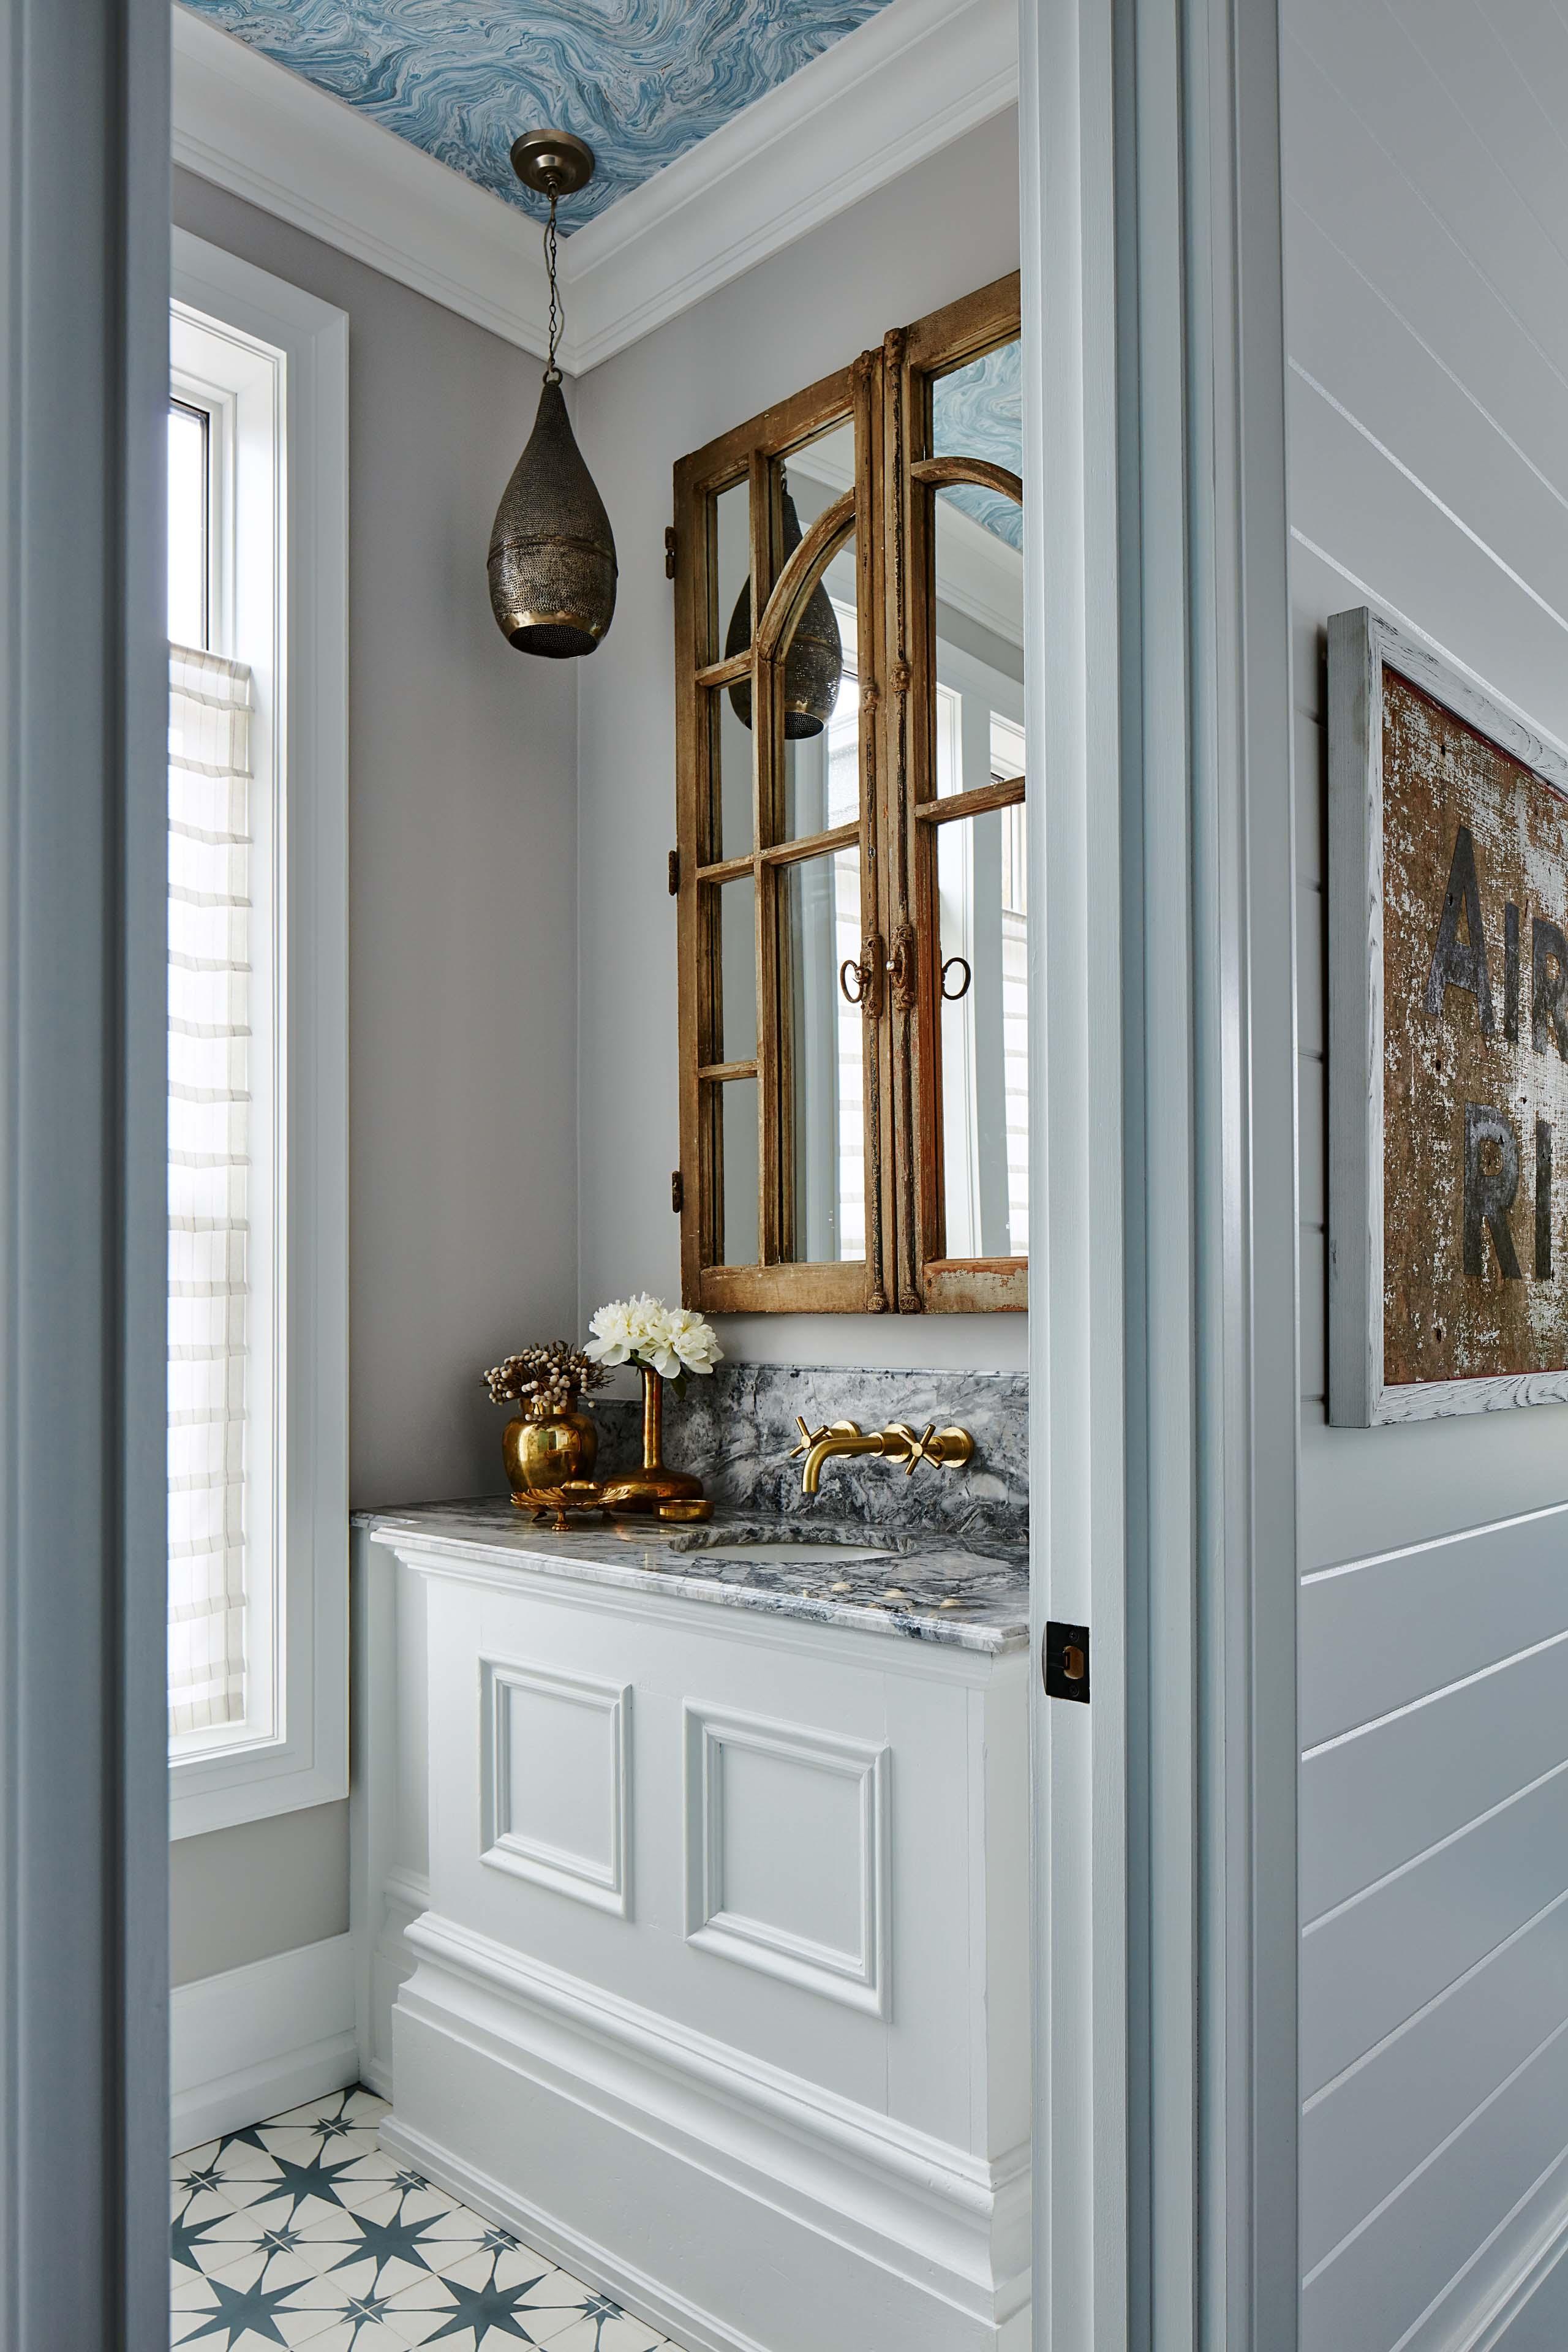 A small powder room feels like a jewel box thanks to pretty star-inspired tiling. #SarahRichardson #powcerroom #blueandwhite #marbledesign